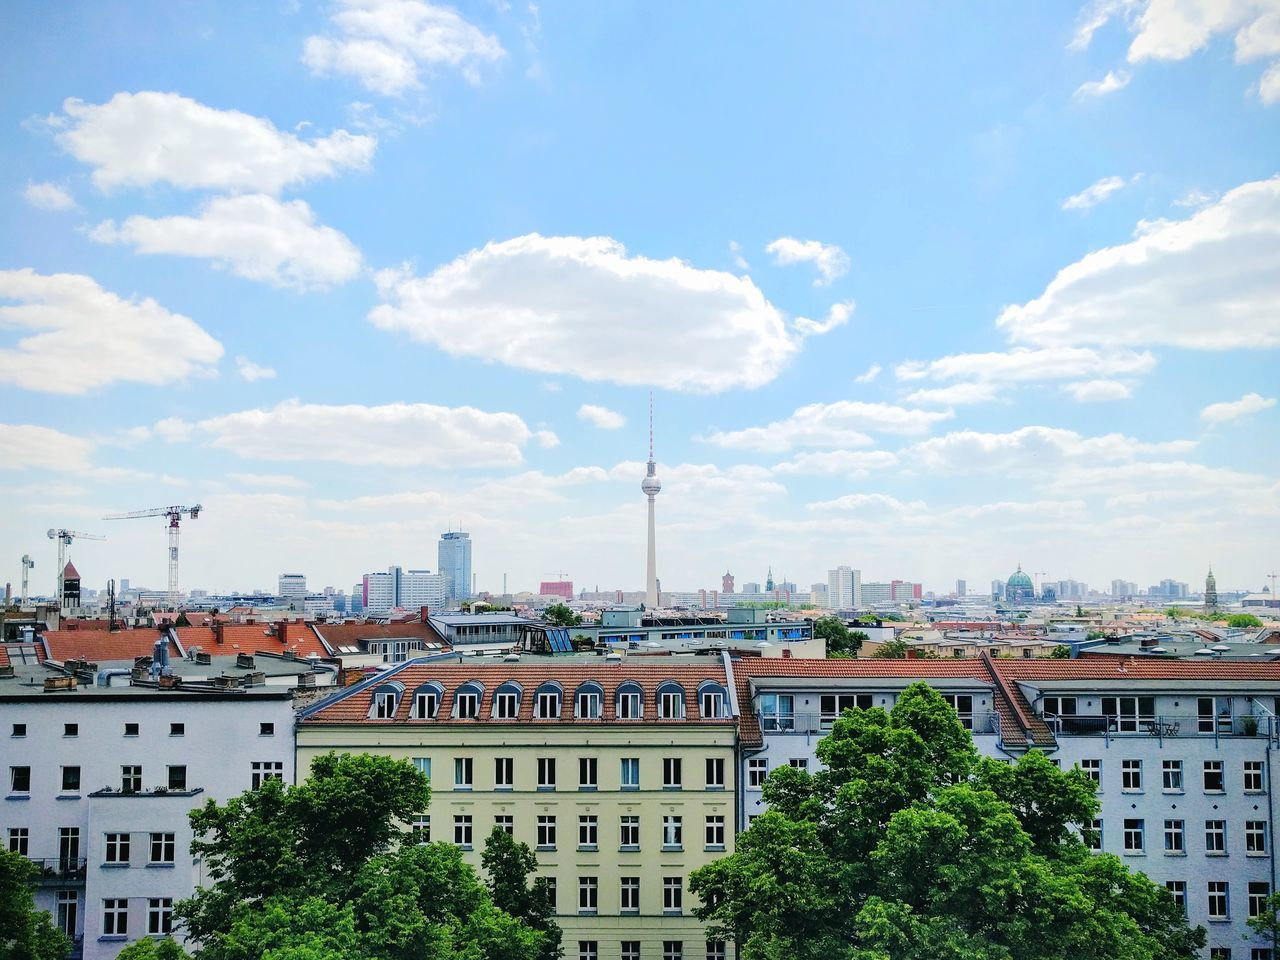 Cityscape City High Angle View Urban Skyline Cloud - Sky My Fuckin Berlin Berlin Berliner Ansichten Auf Den Dächern Einer Stadt Travel Destinations Live For The Story BYOPaper!